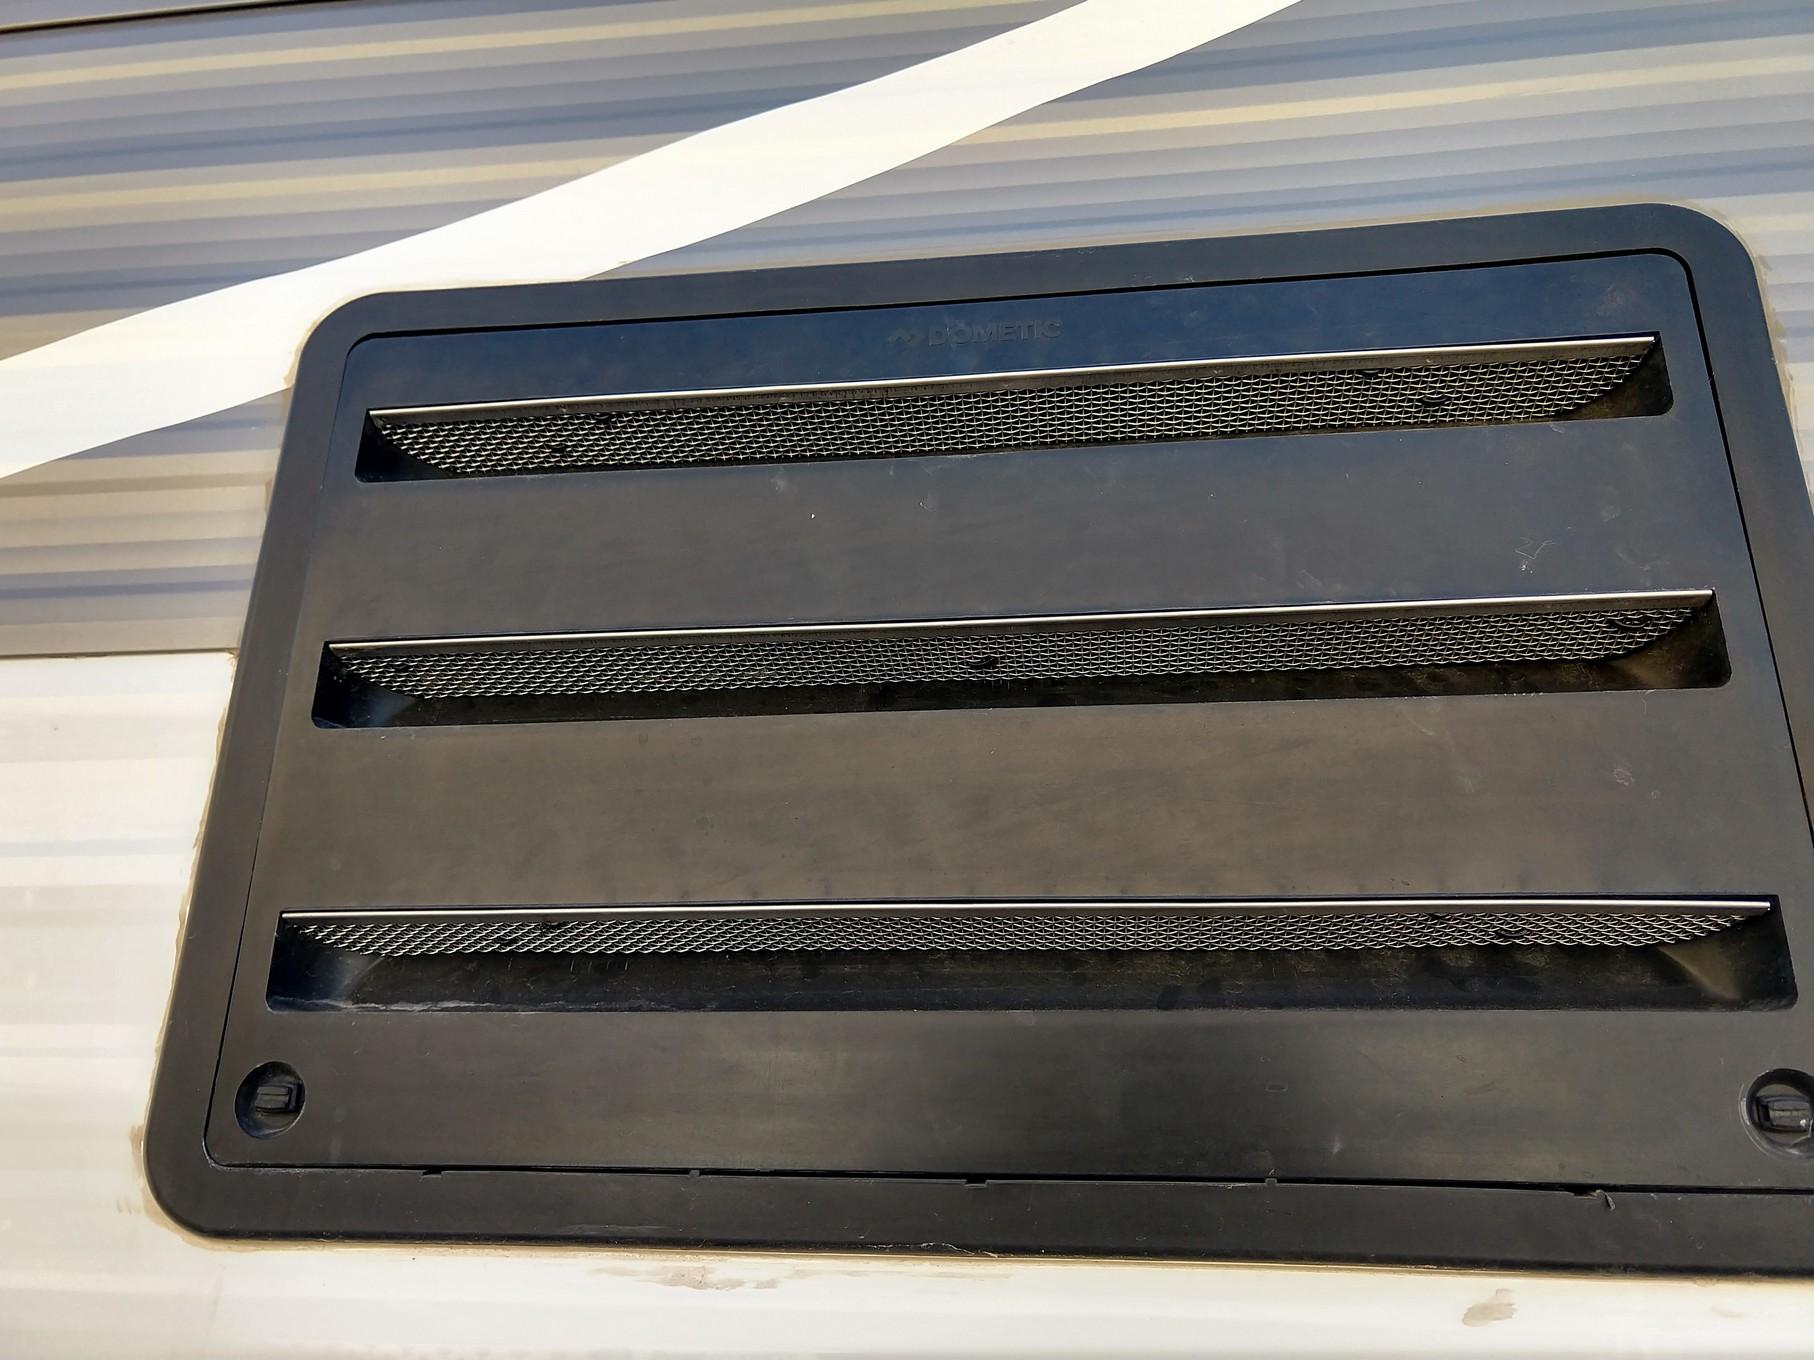 screens on fridge vents (2)